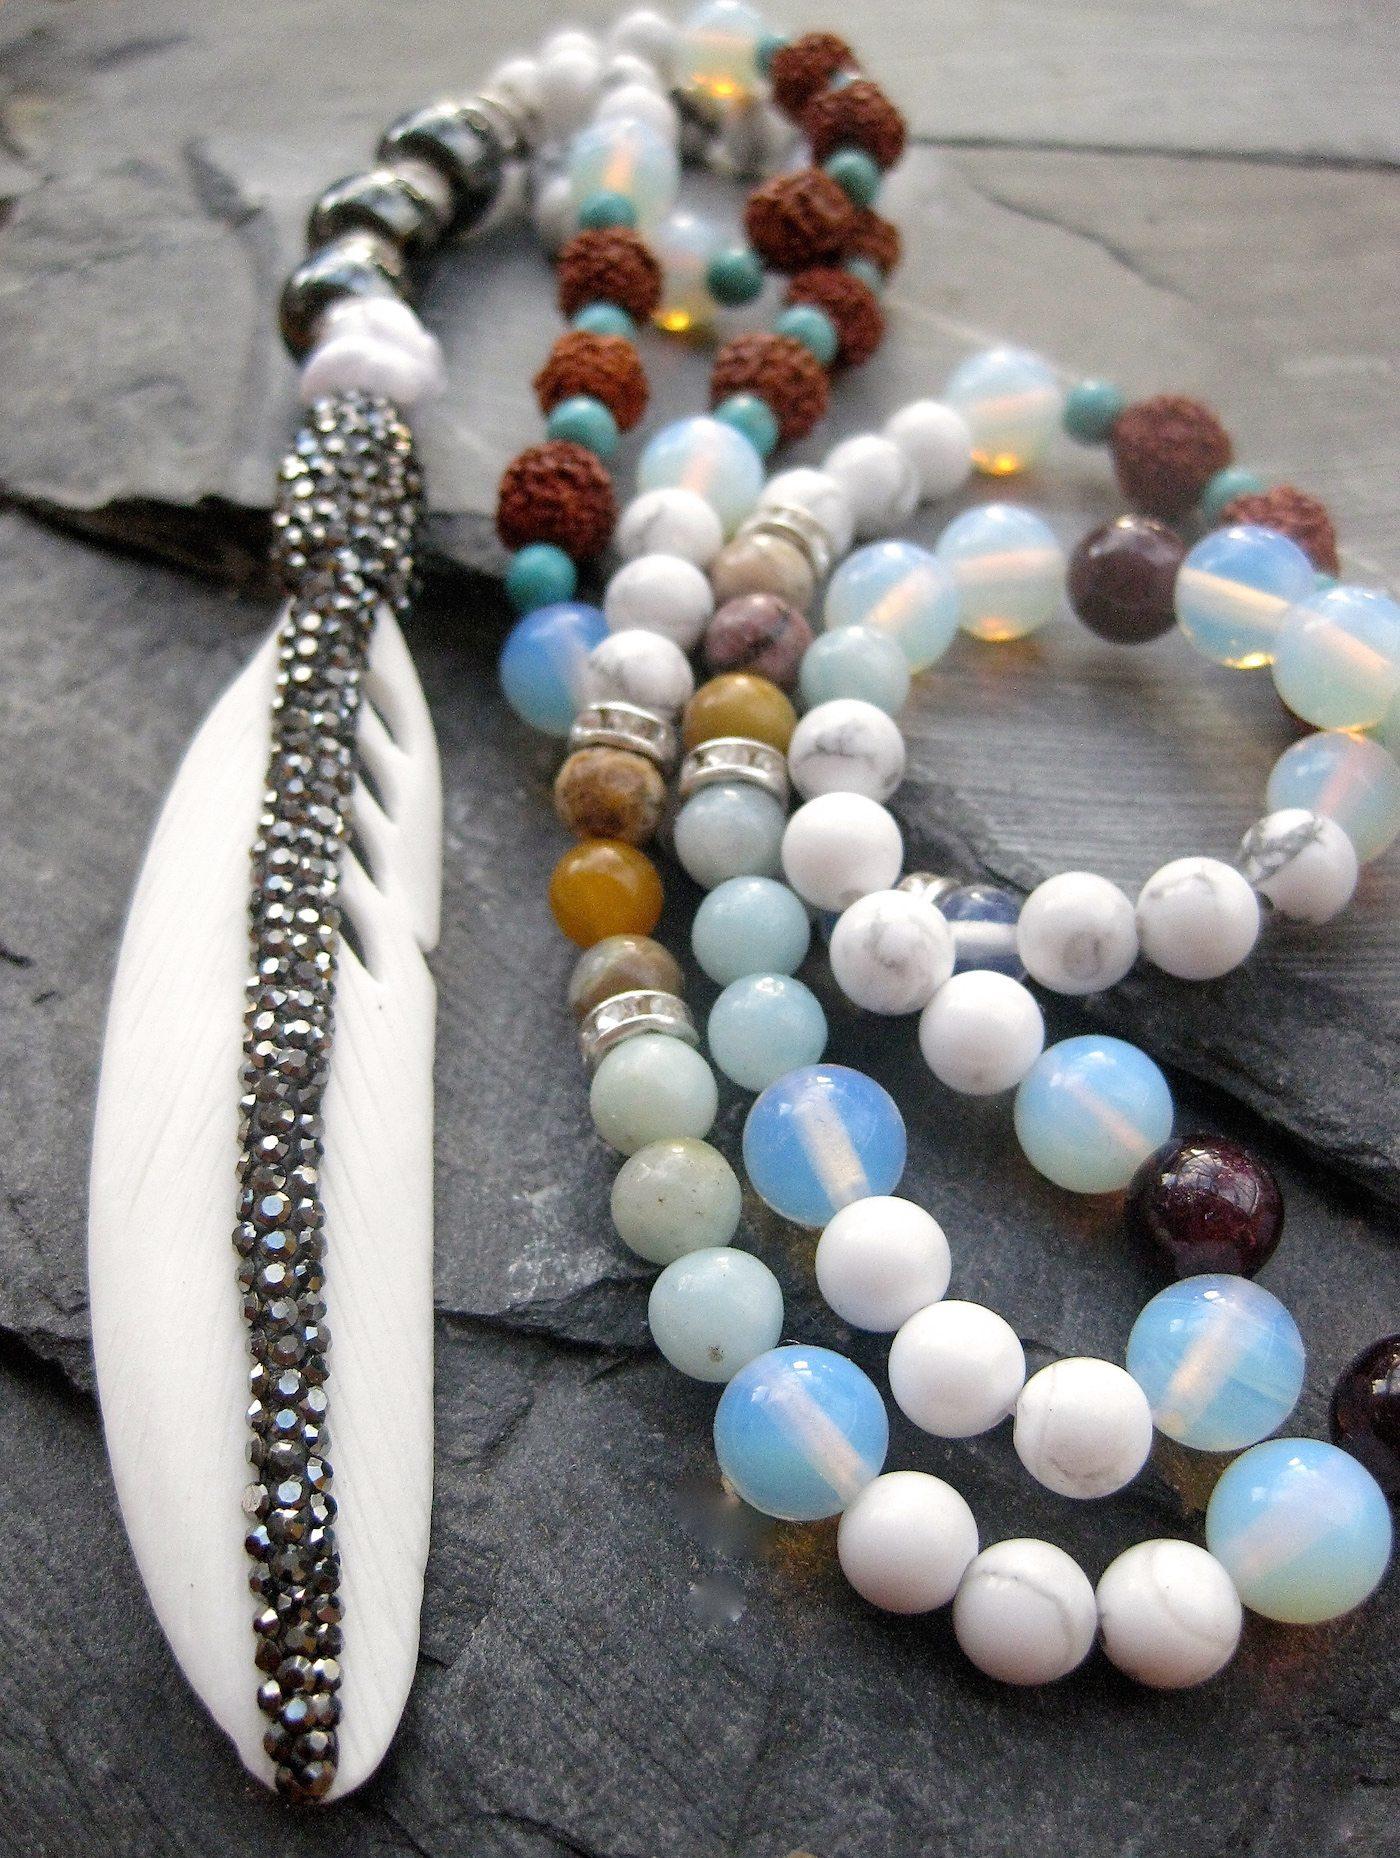 mala necklace with feather bone, moonstone, garnet, multi coloured amazonite necklace, rudrasha beads, turqiouse, white howlite beads semi precious stones